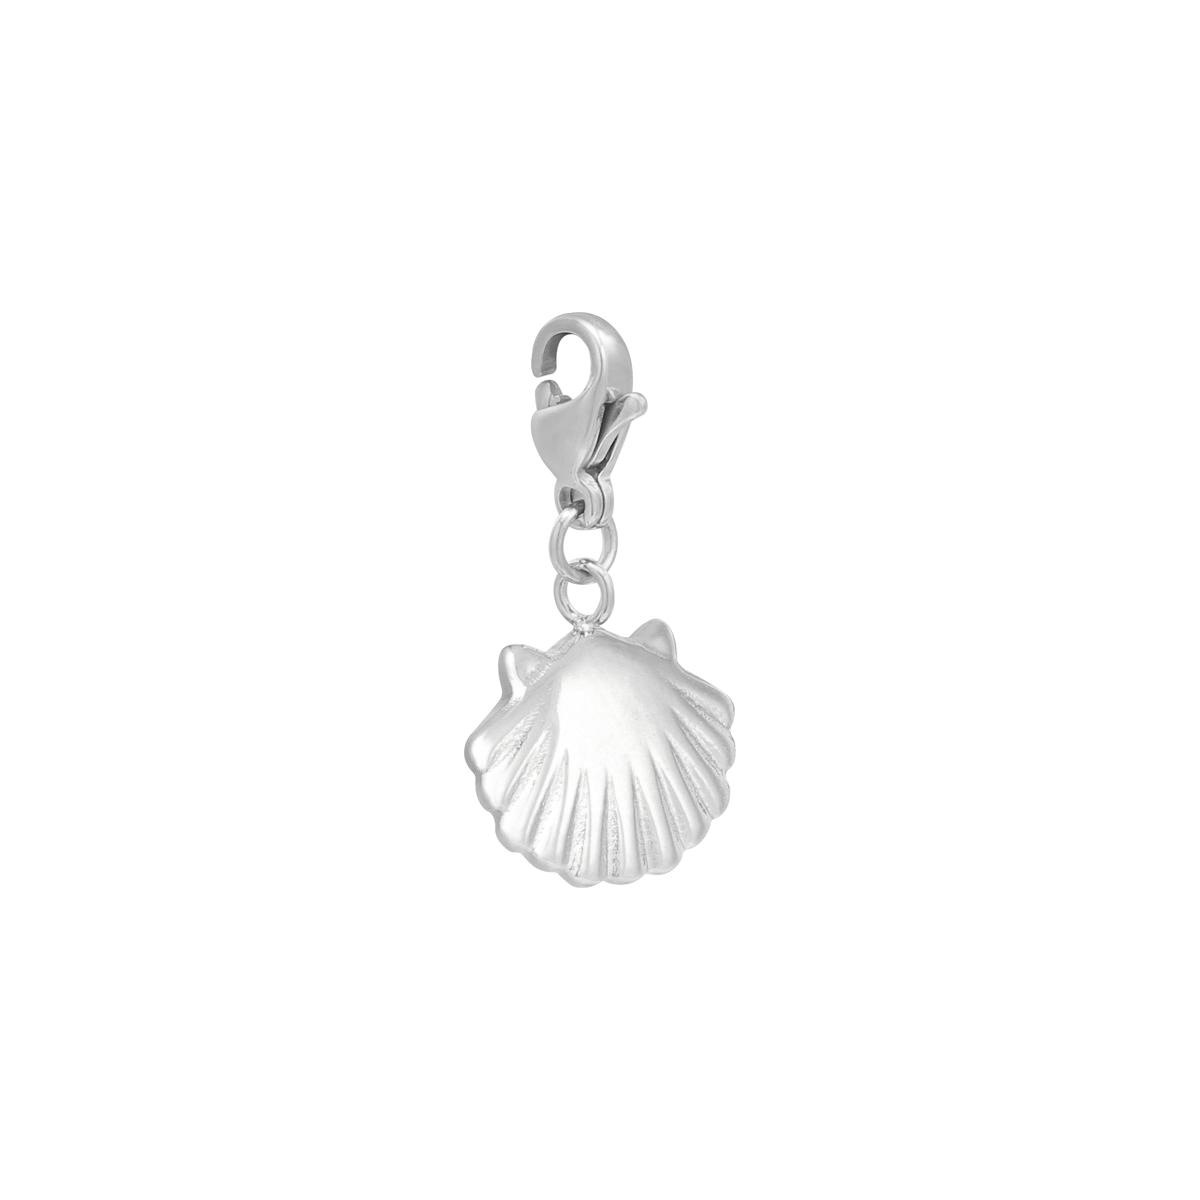 DIY Clasp Charm Clam Shell